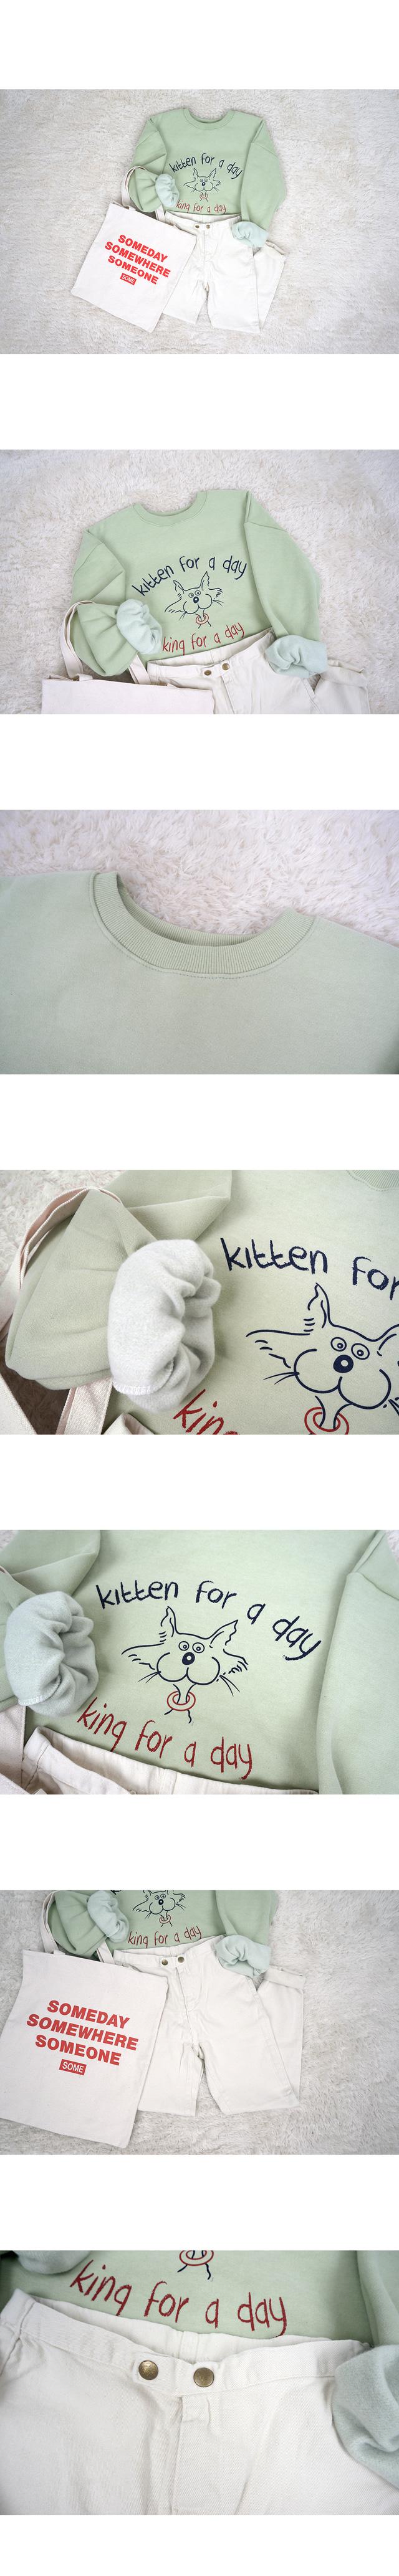 Kitten Day MTM